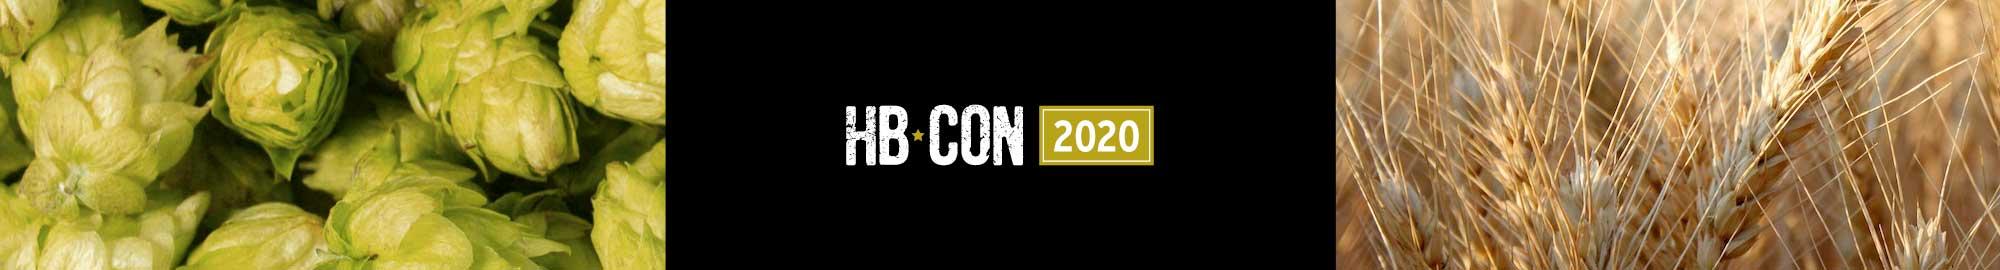 Heimbrau Convention